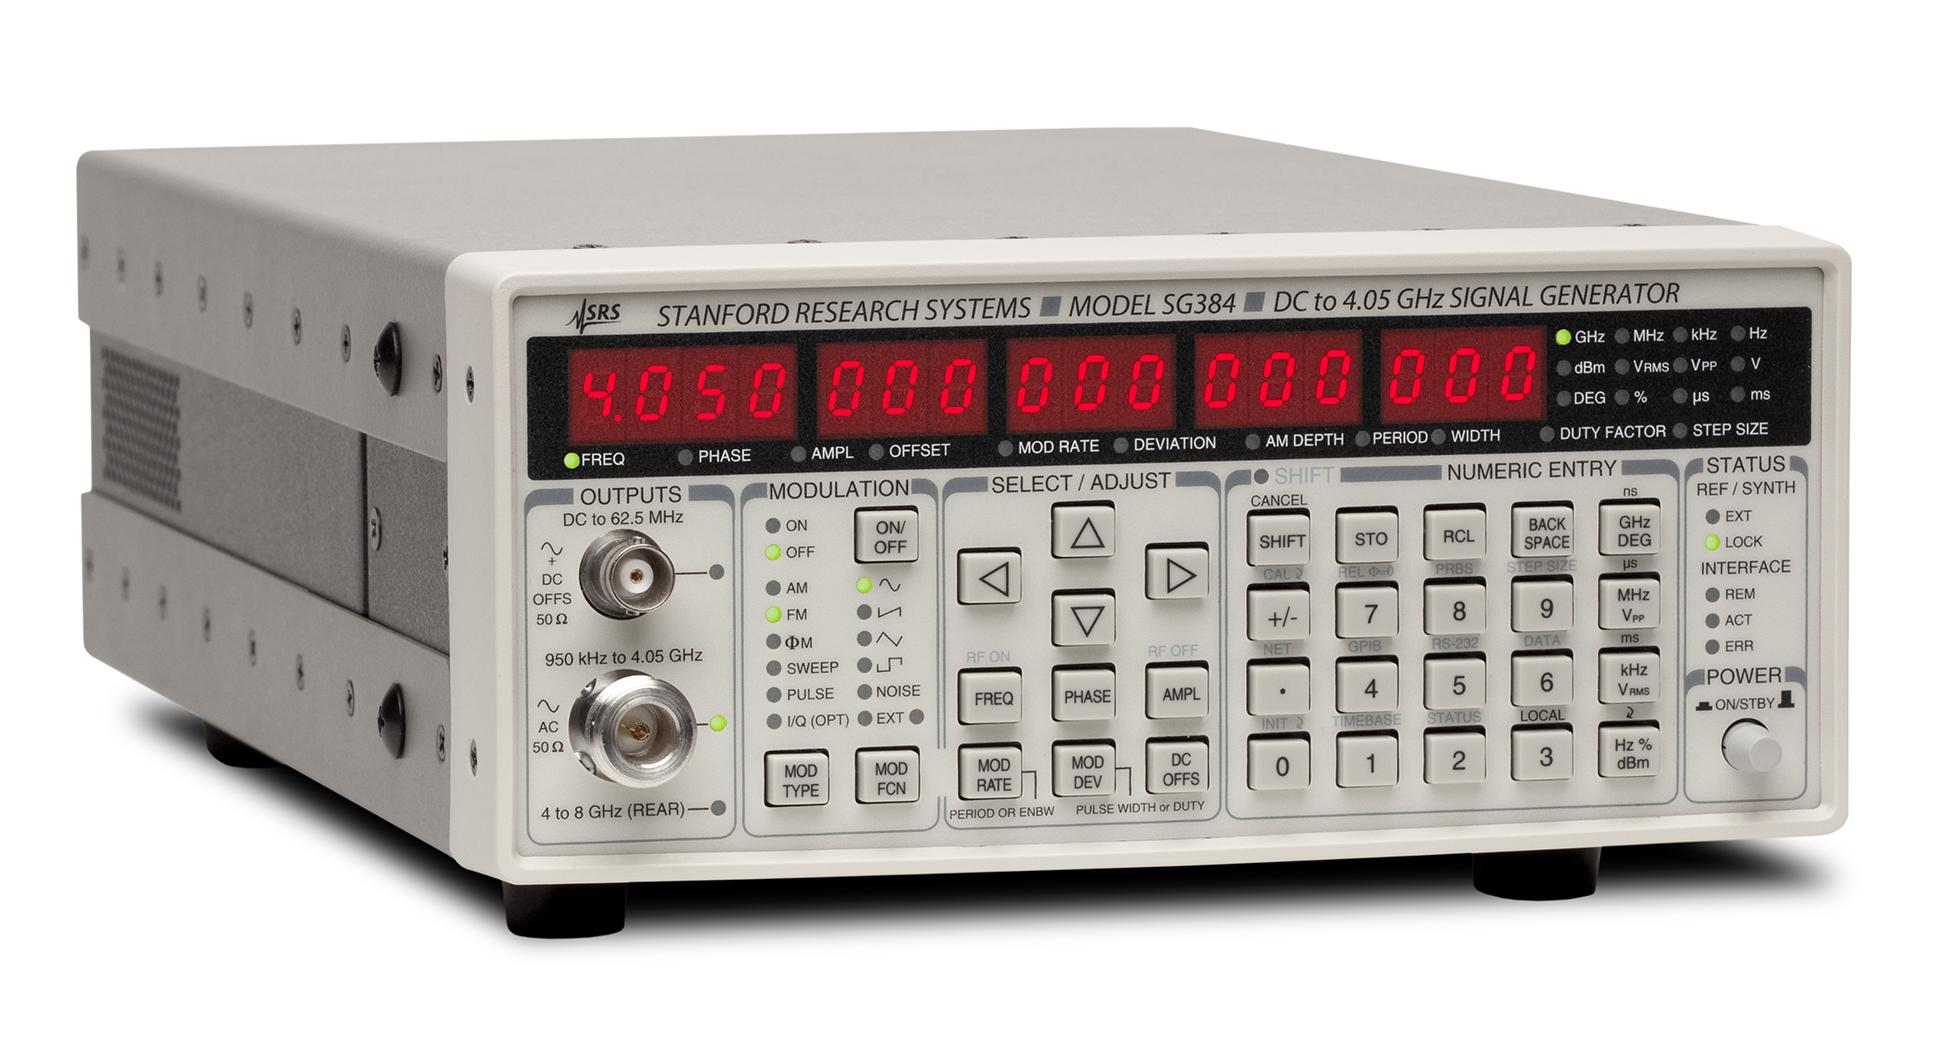 Stanford Research Systems SG384 аналоговый генератор ВЧ сигналов